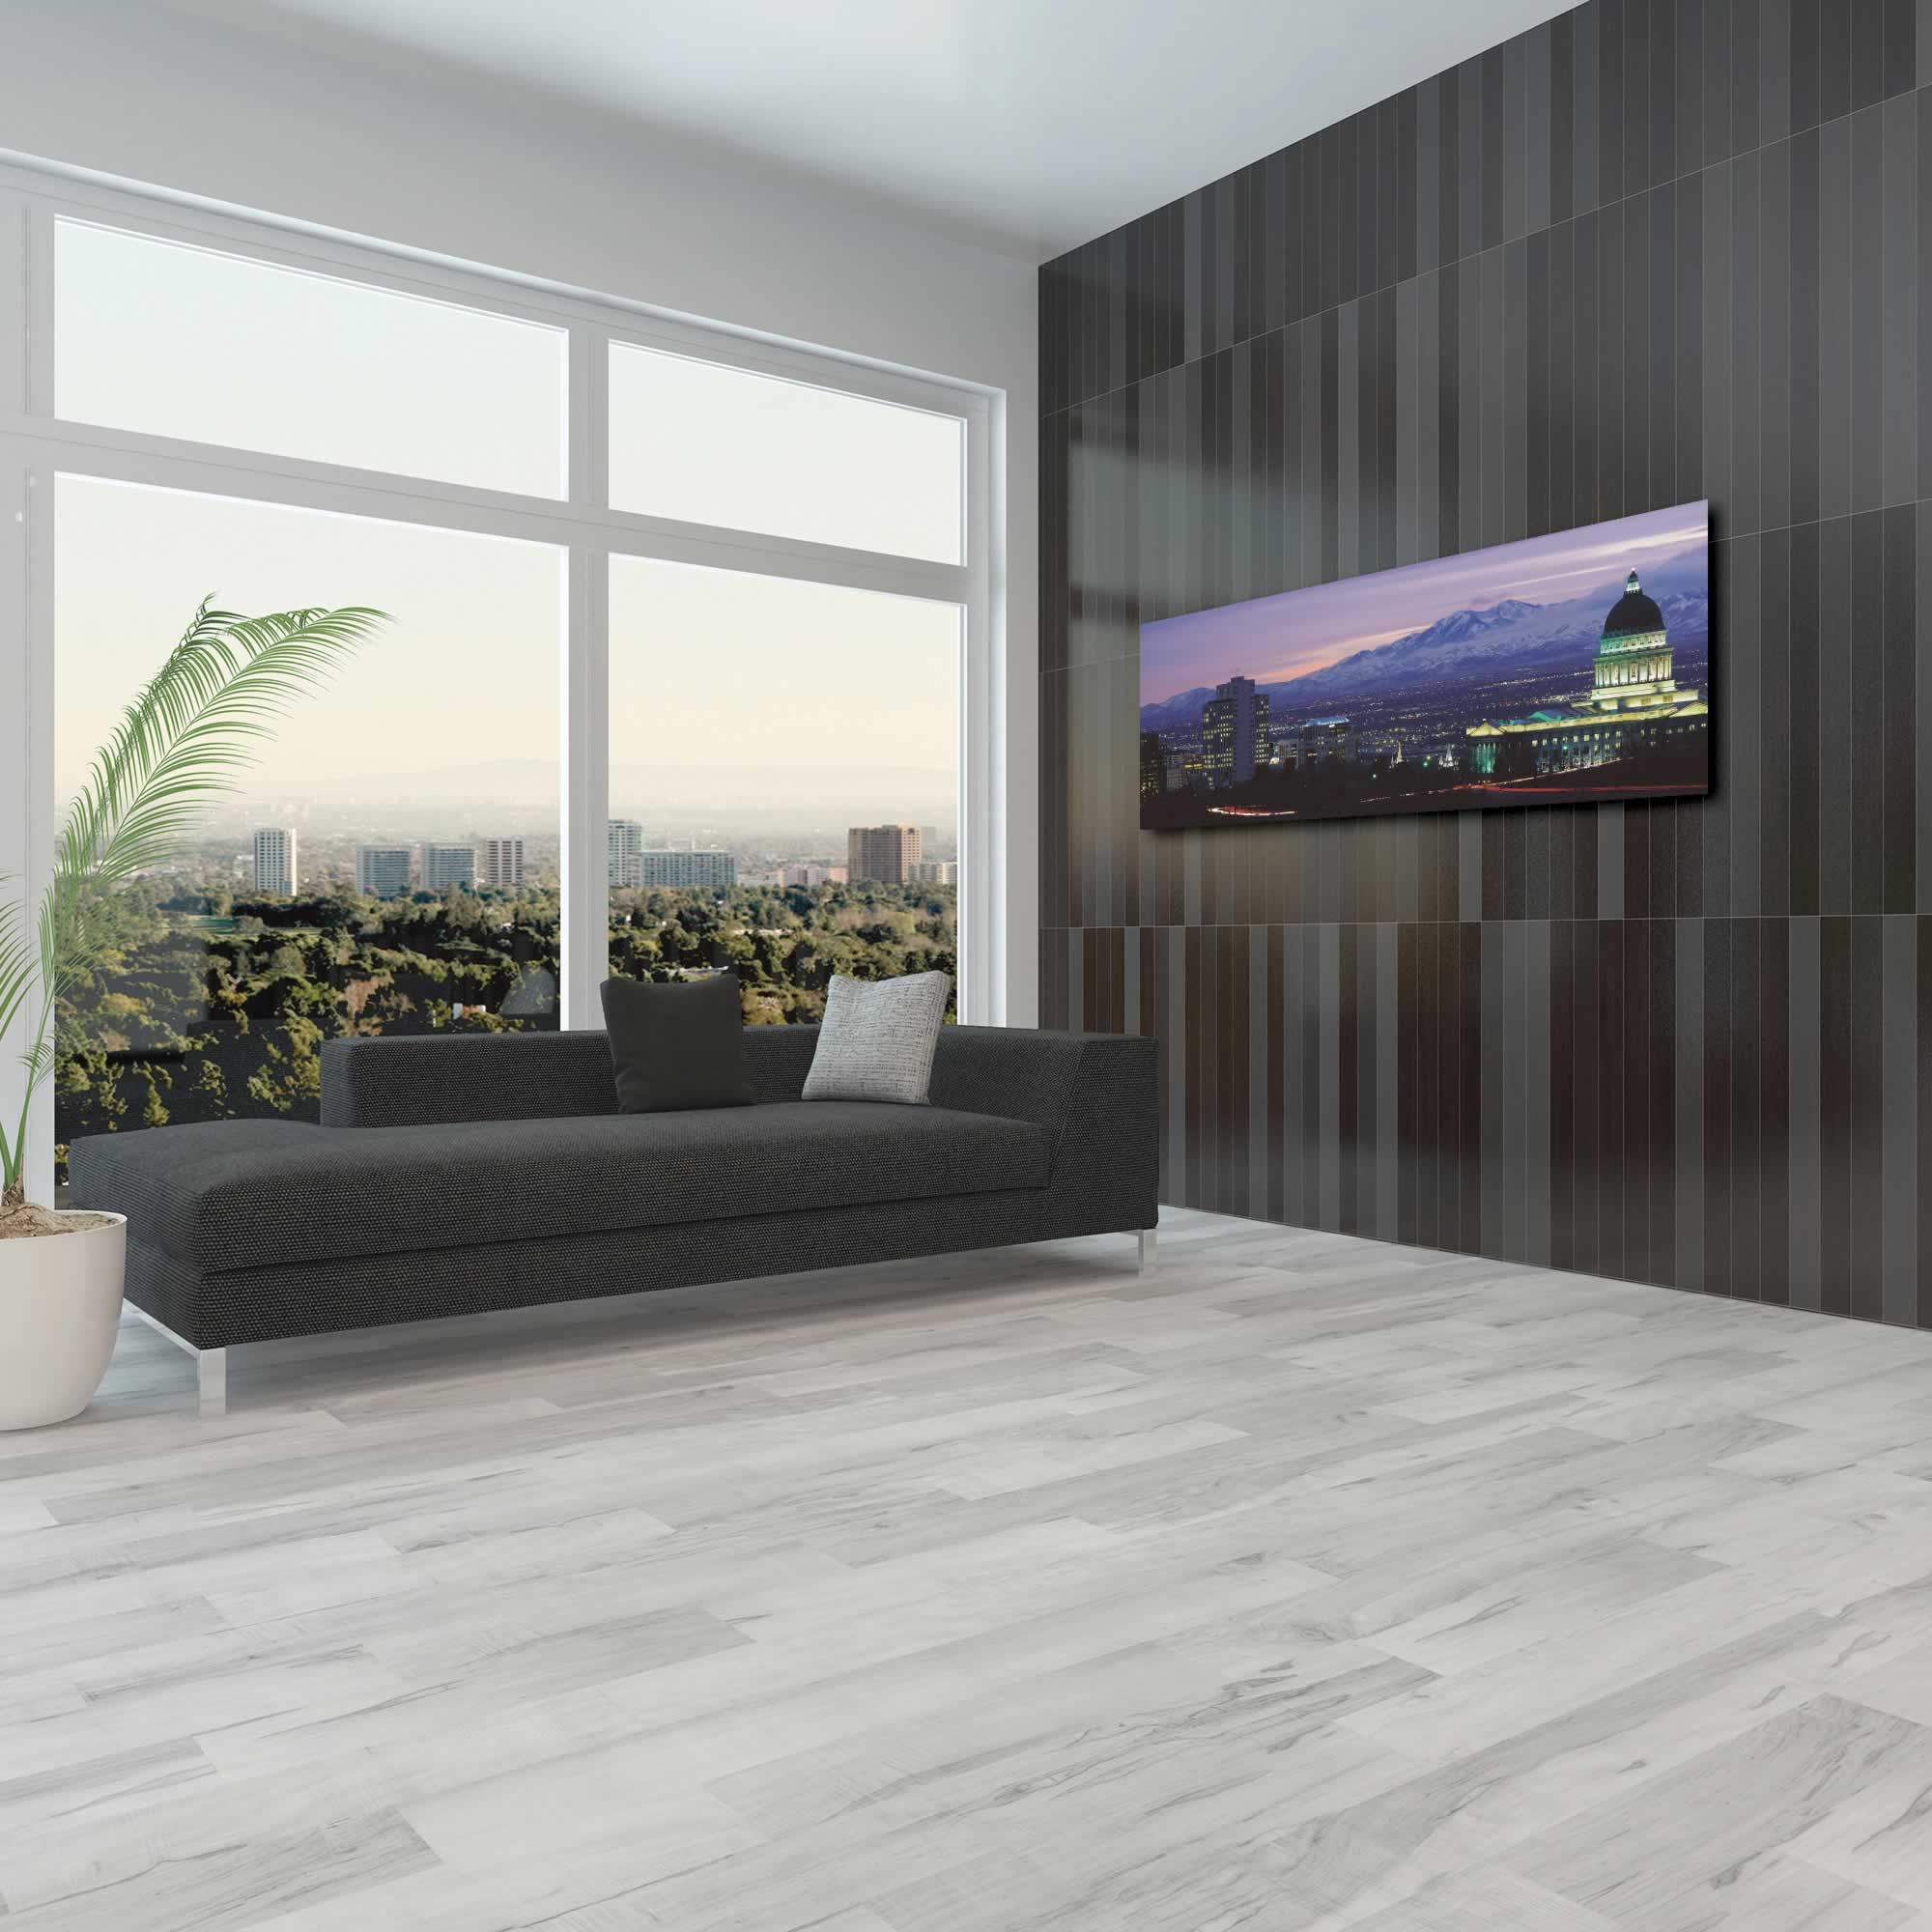 Salt Lake City Skyline - Urban Modern Art, Designer Home Decor, Cityscape Wall Artwork, Trendy Contemporary Art - Alternate View 3